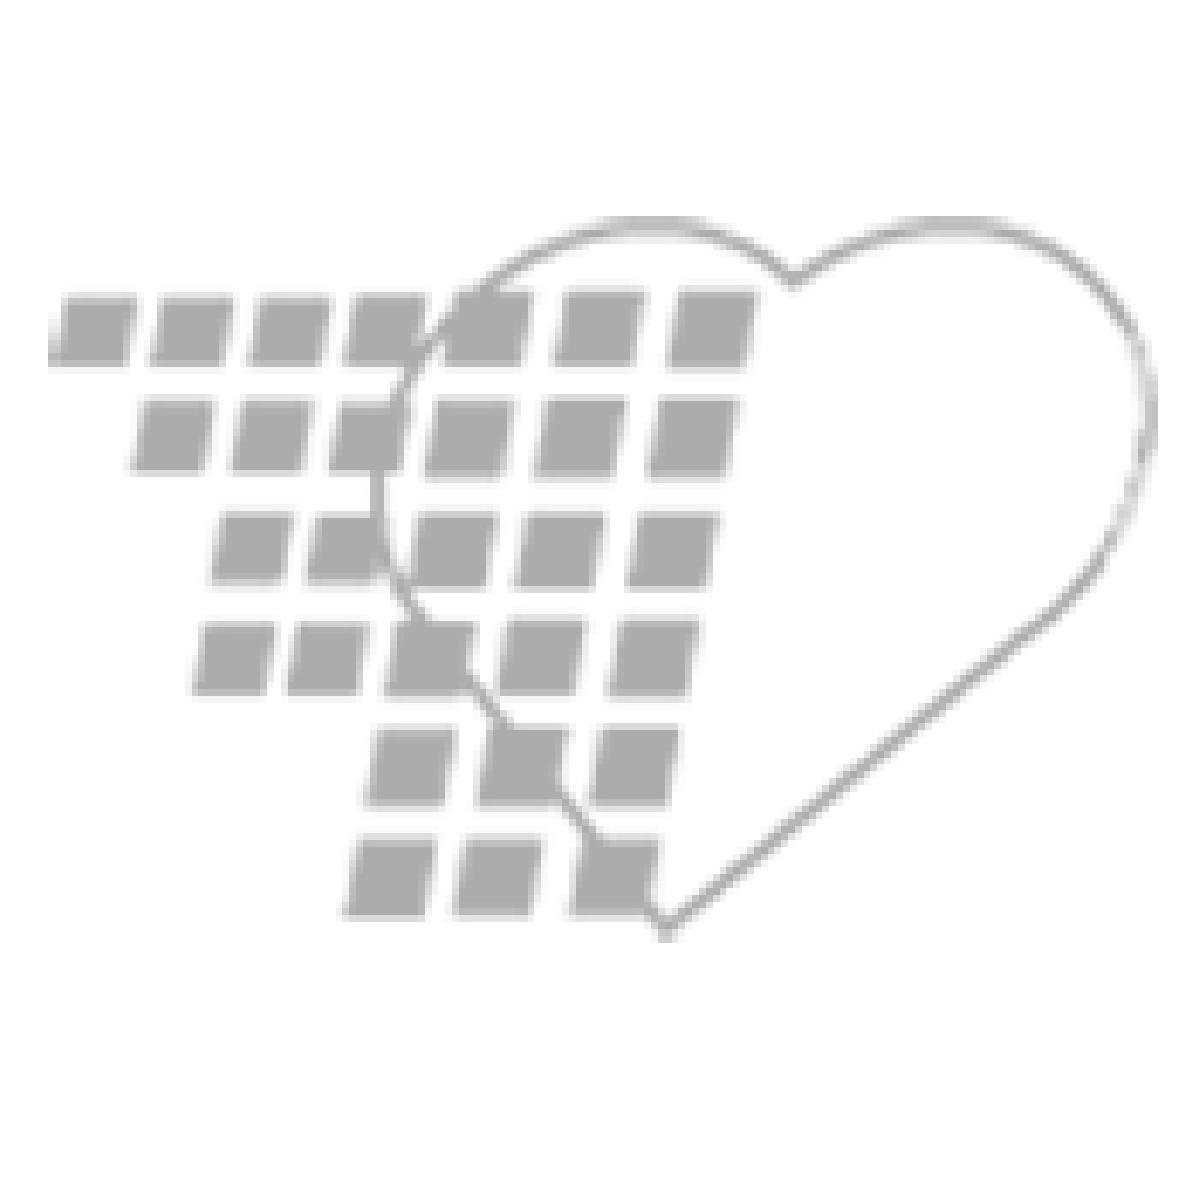 07-71-1170P Shiley Adult Tracheostomy Tube